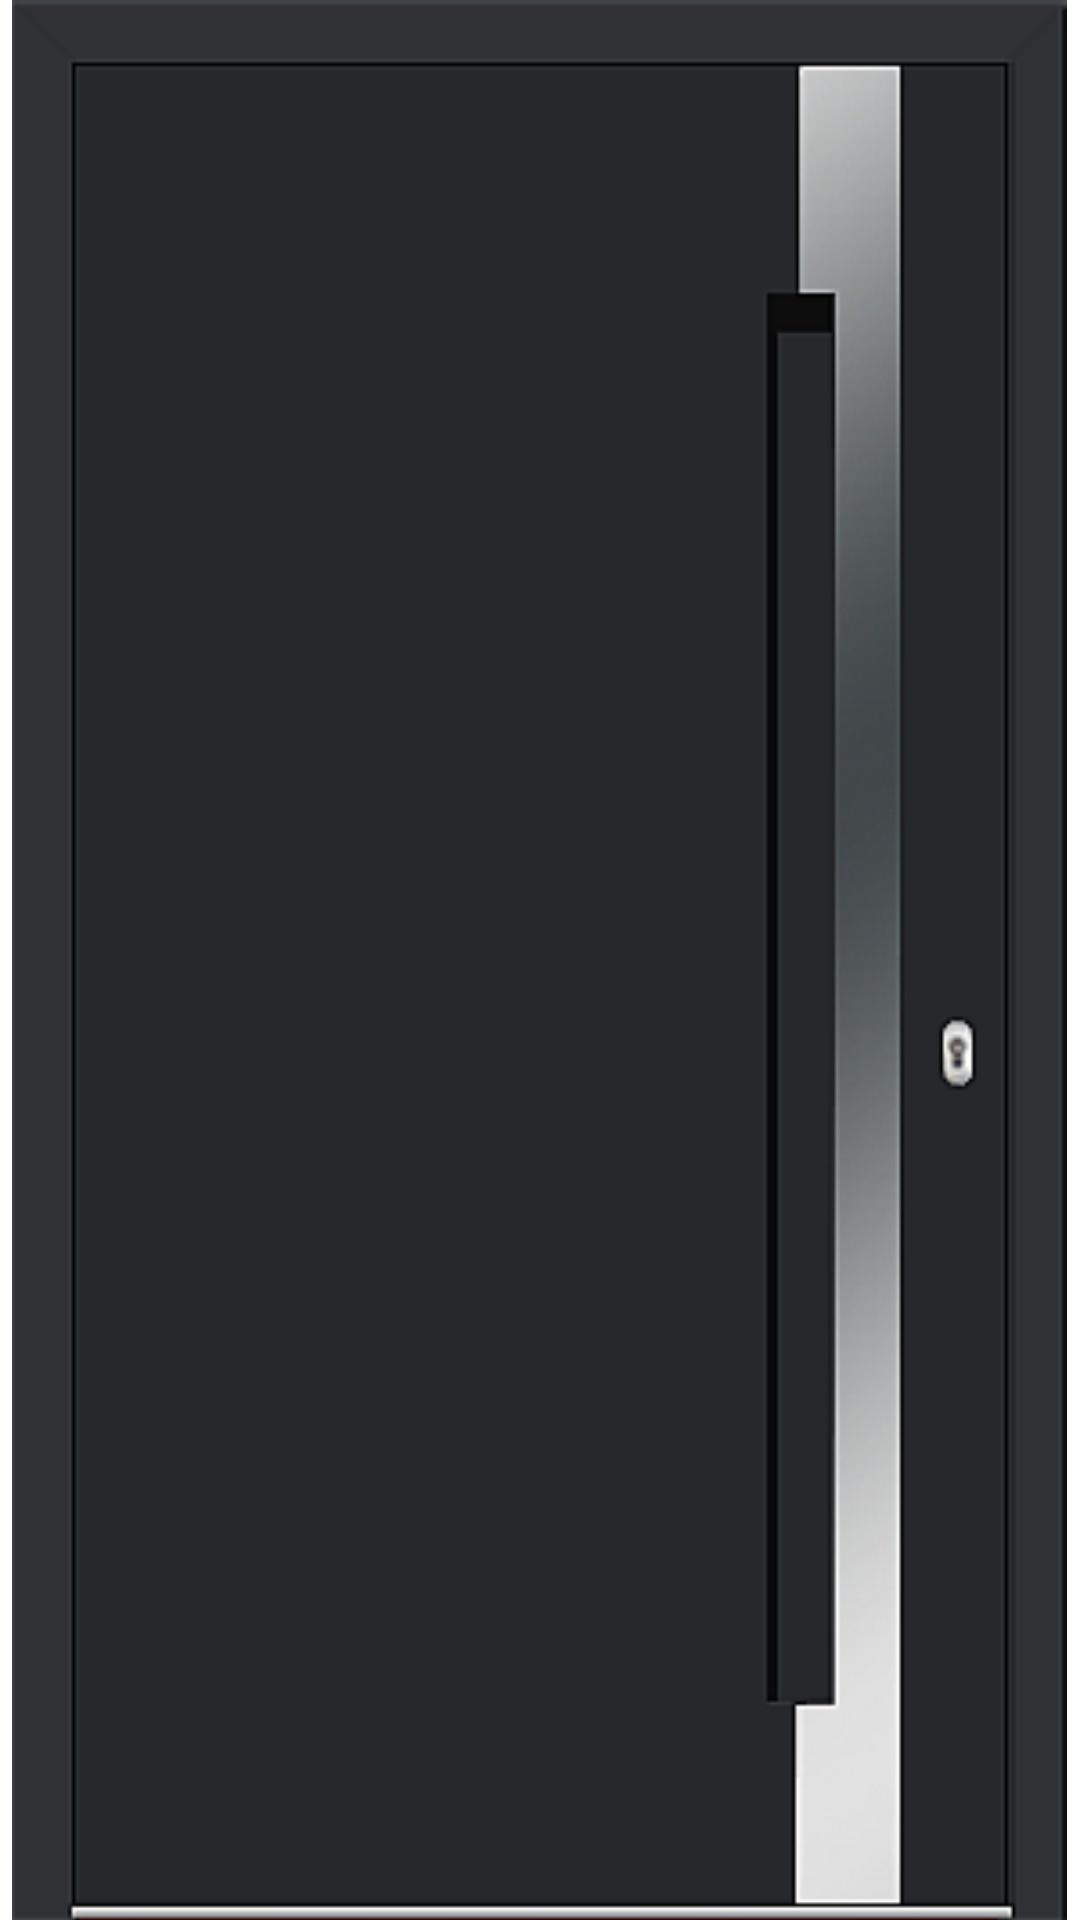 Aluminium Haustür Modell 6974-40 schwarz